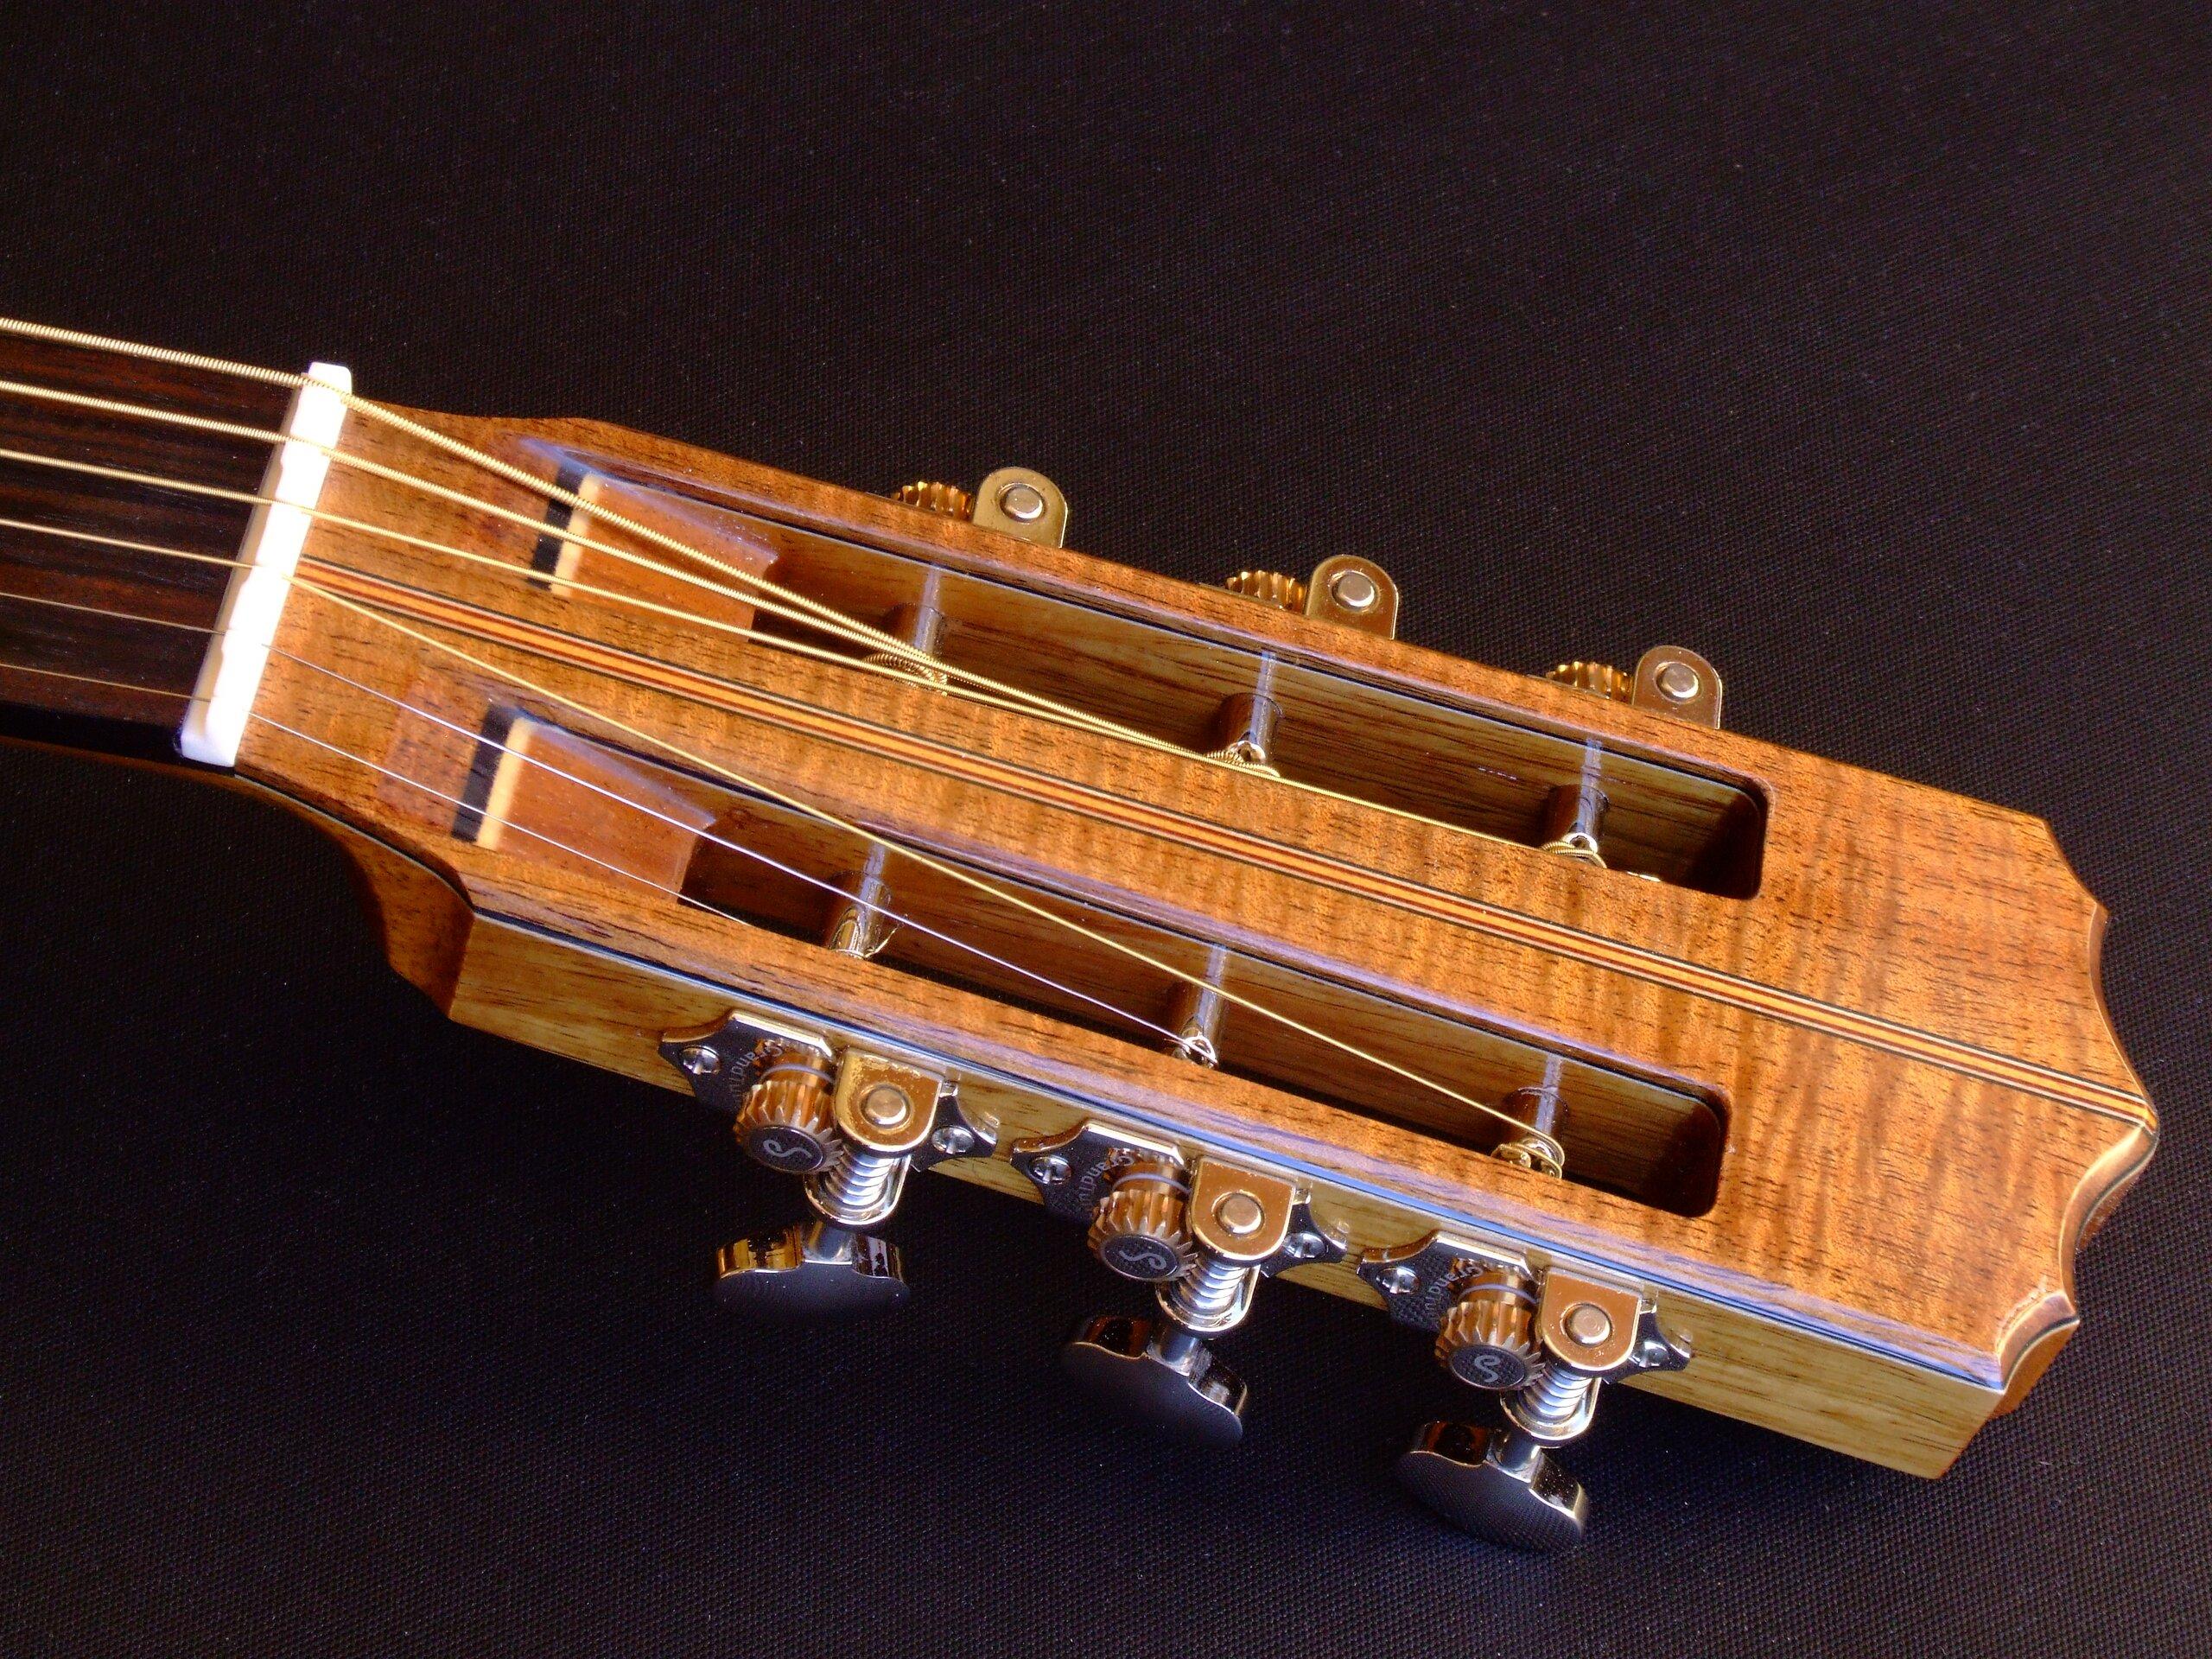 Slot headstock on a steel string guitar